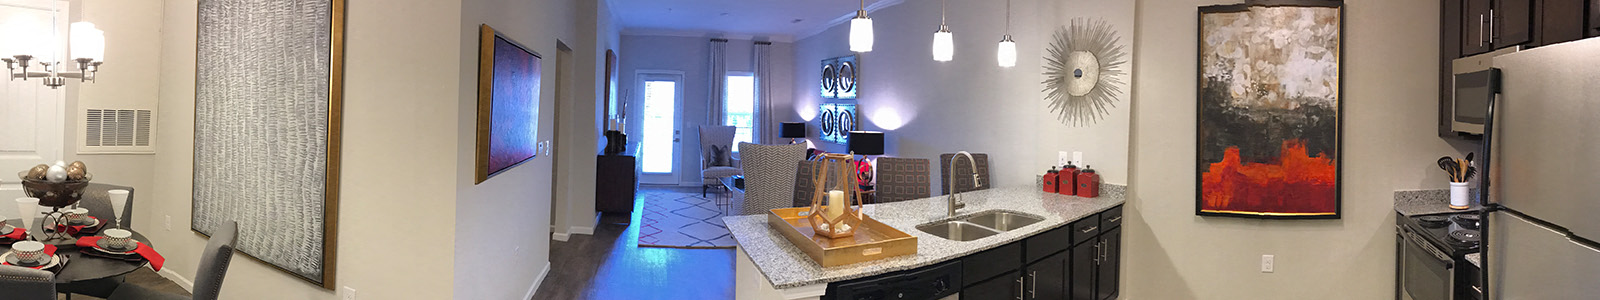 Upgraded Interiors At Horizons At Steele Creek, Charlotte, NC, 28273